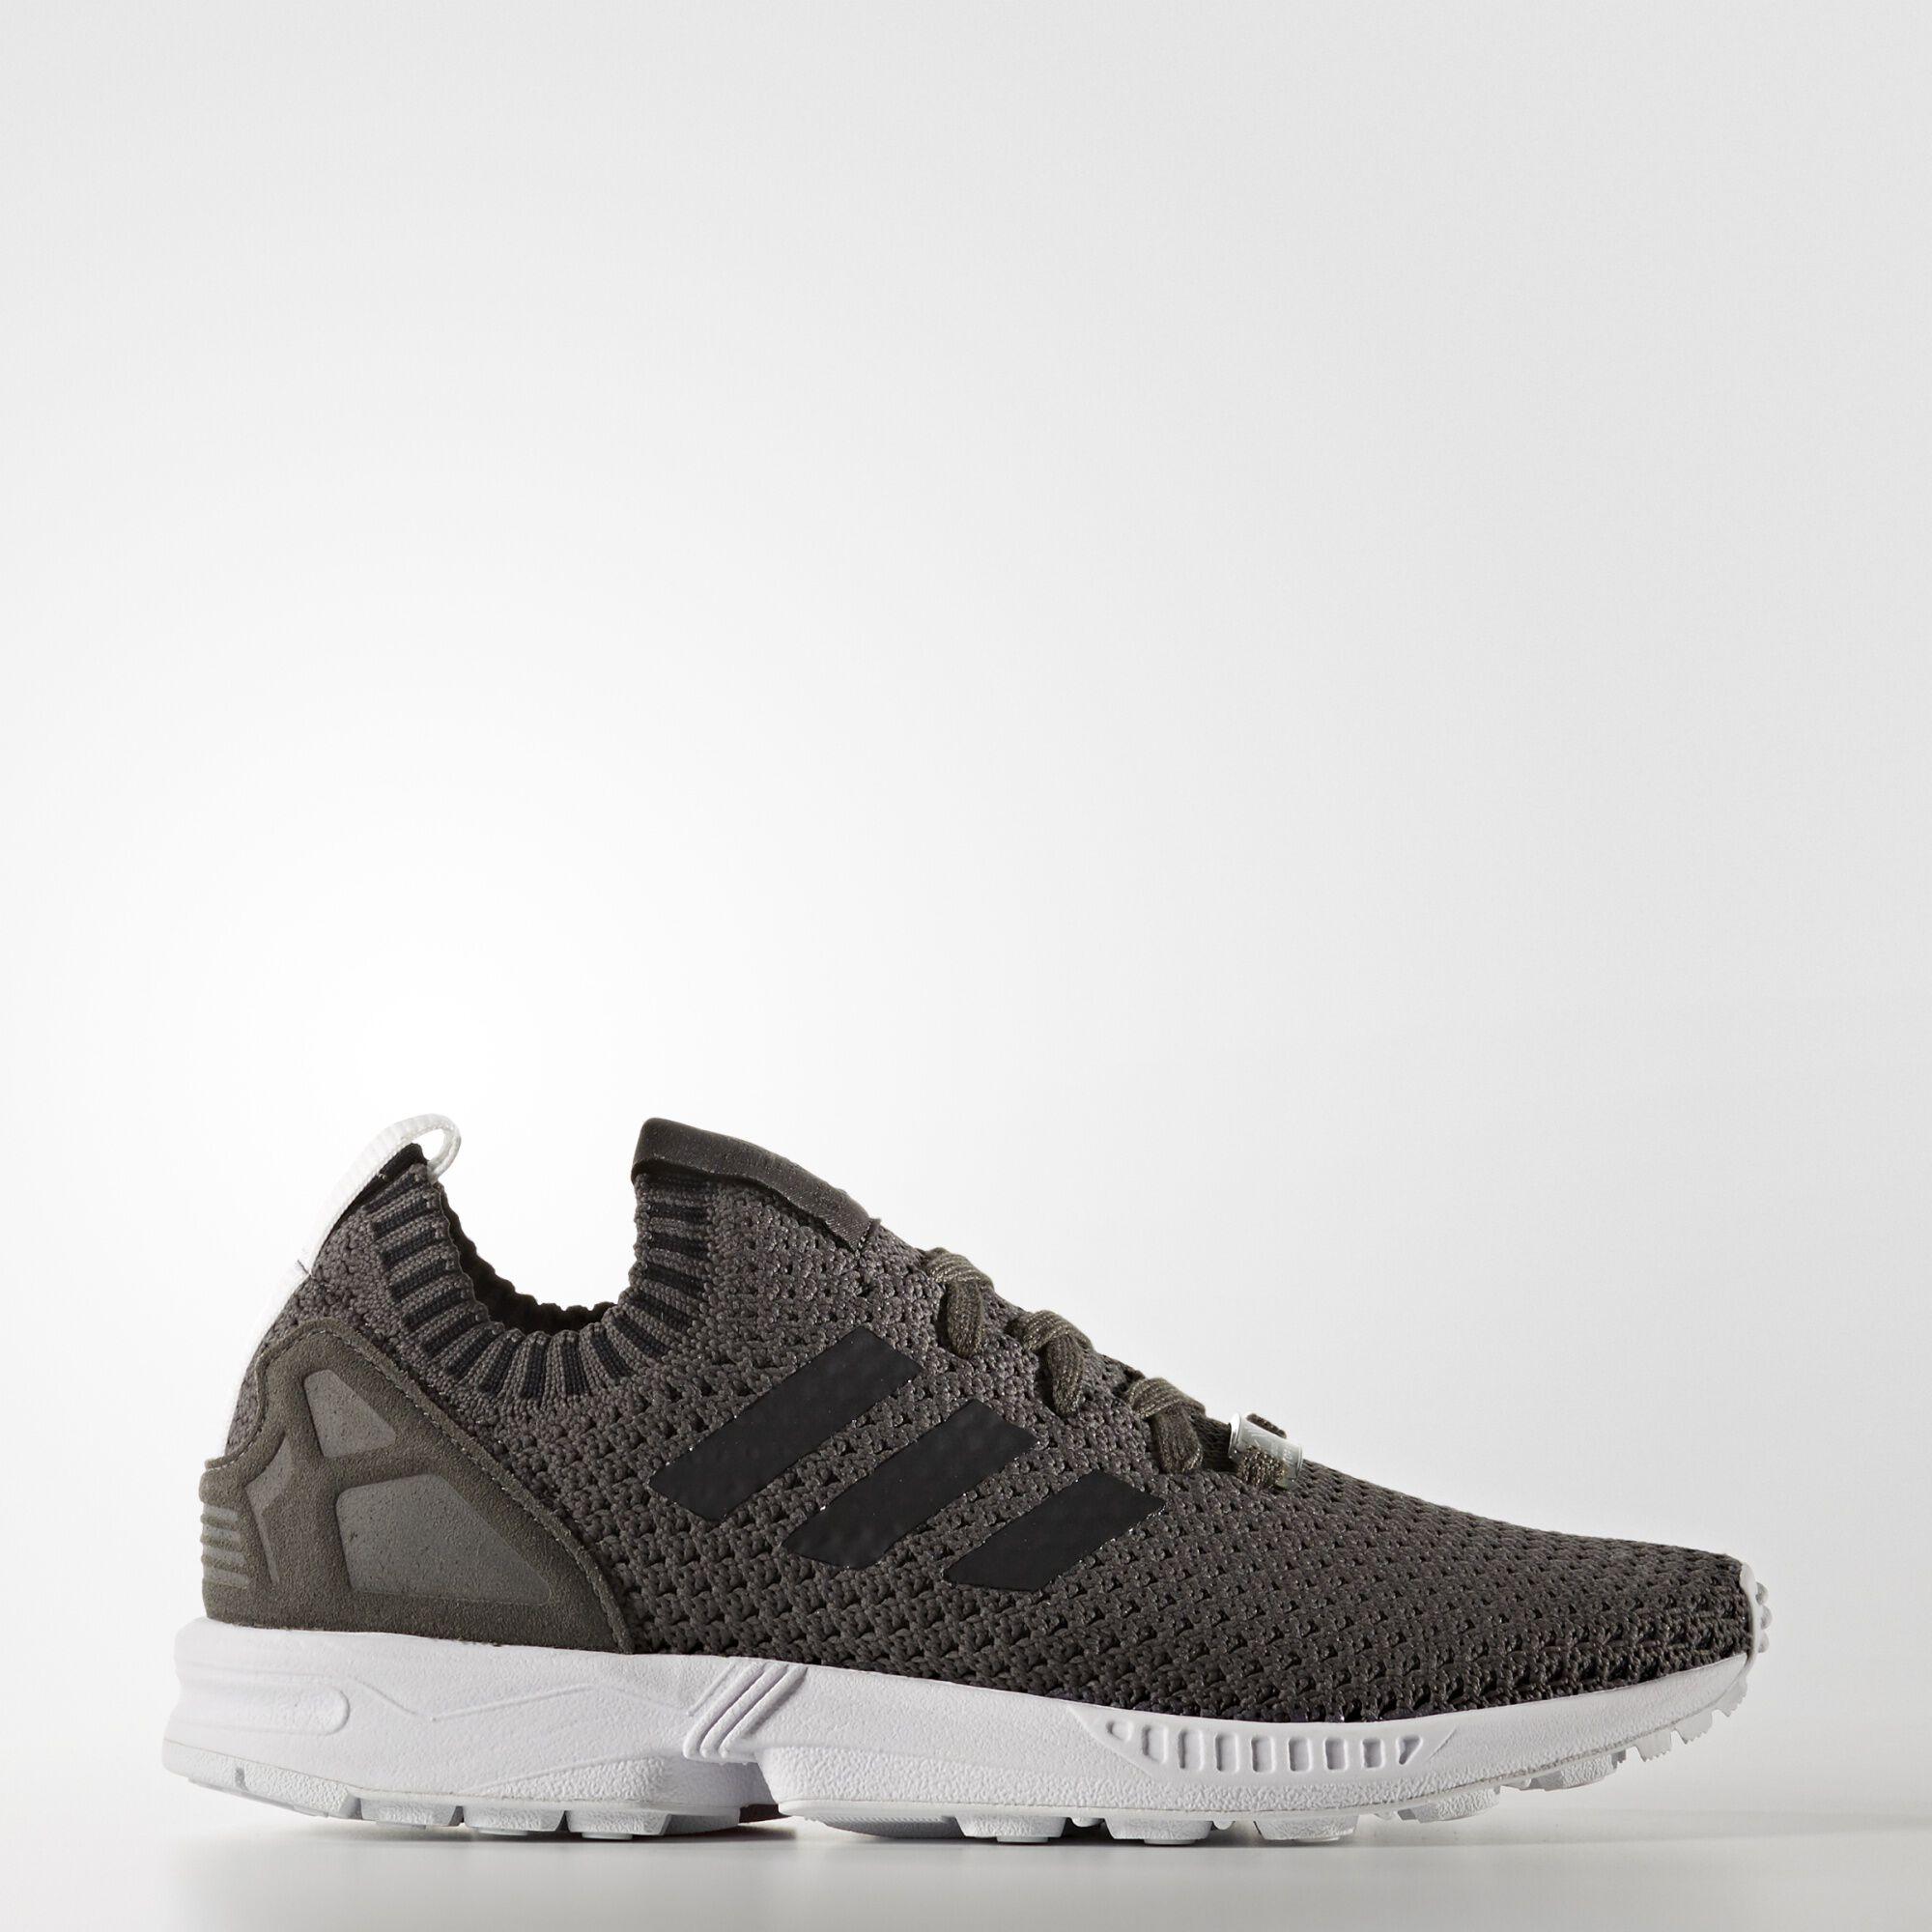 low priced de6aa bffa1 adidas flux zx grey